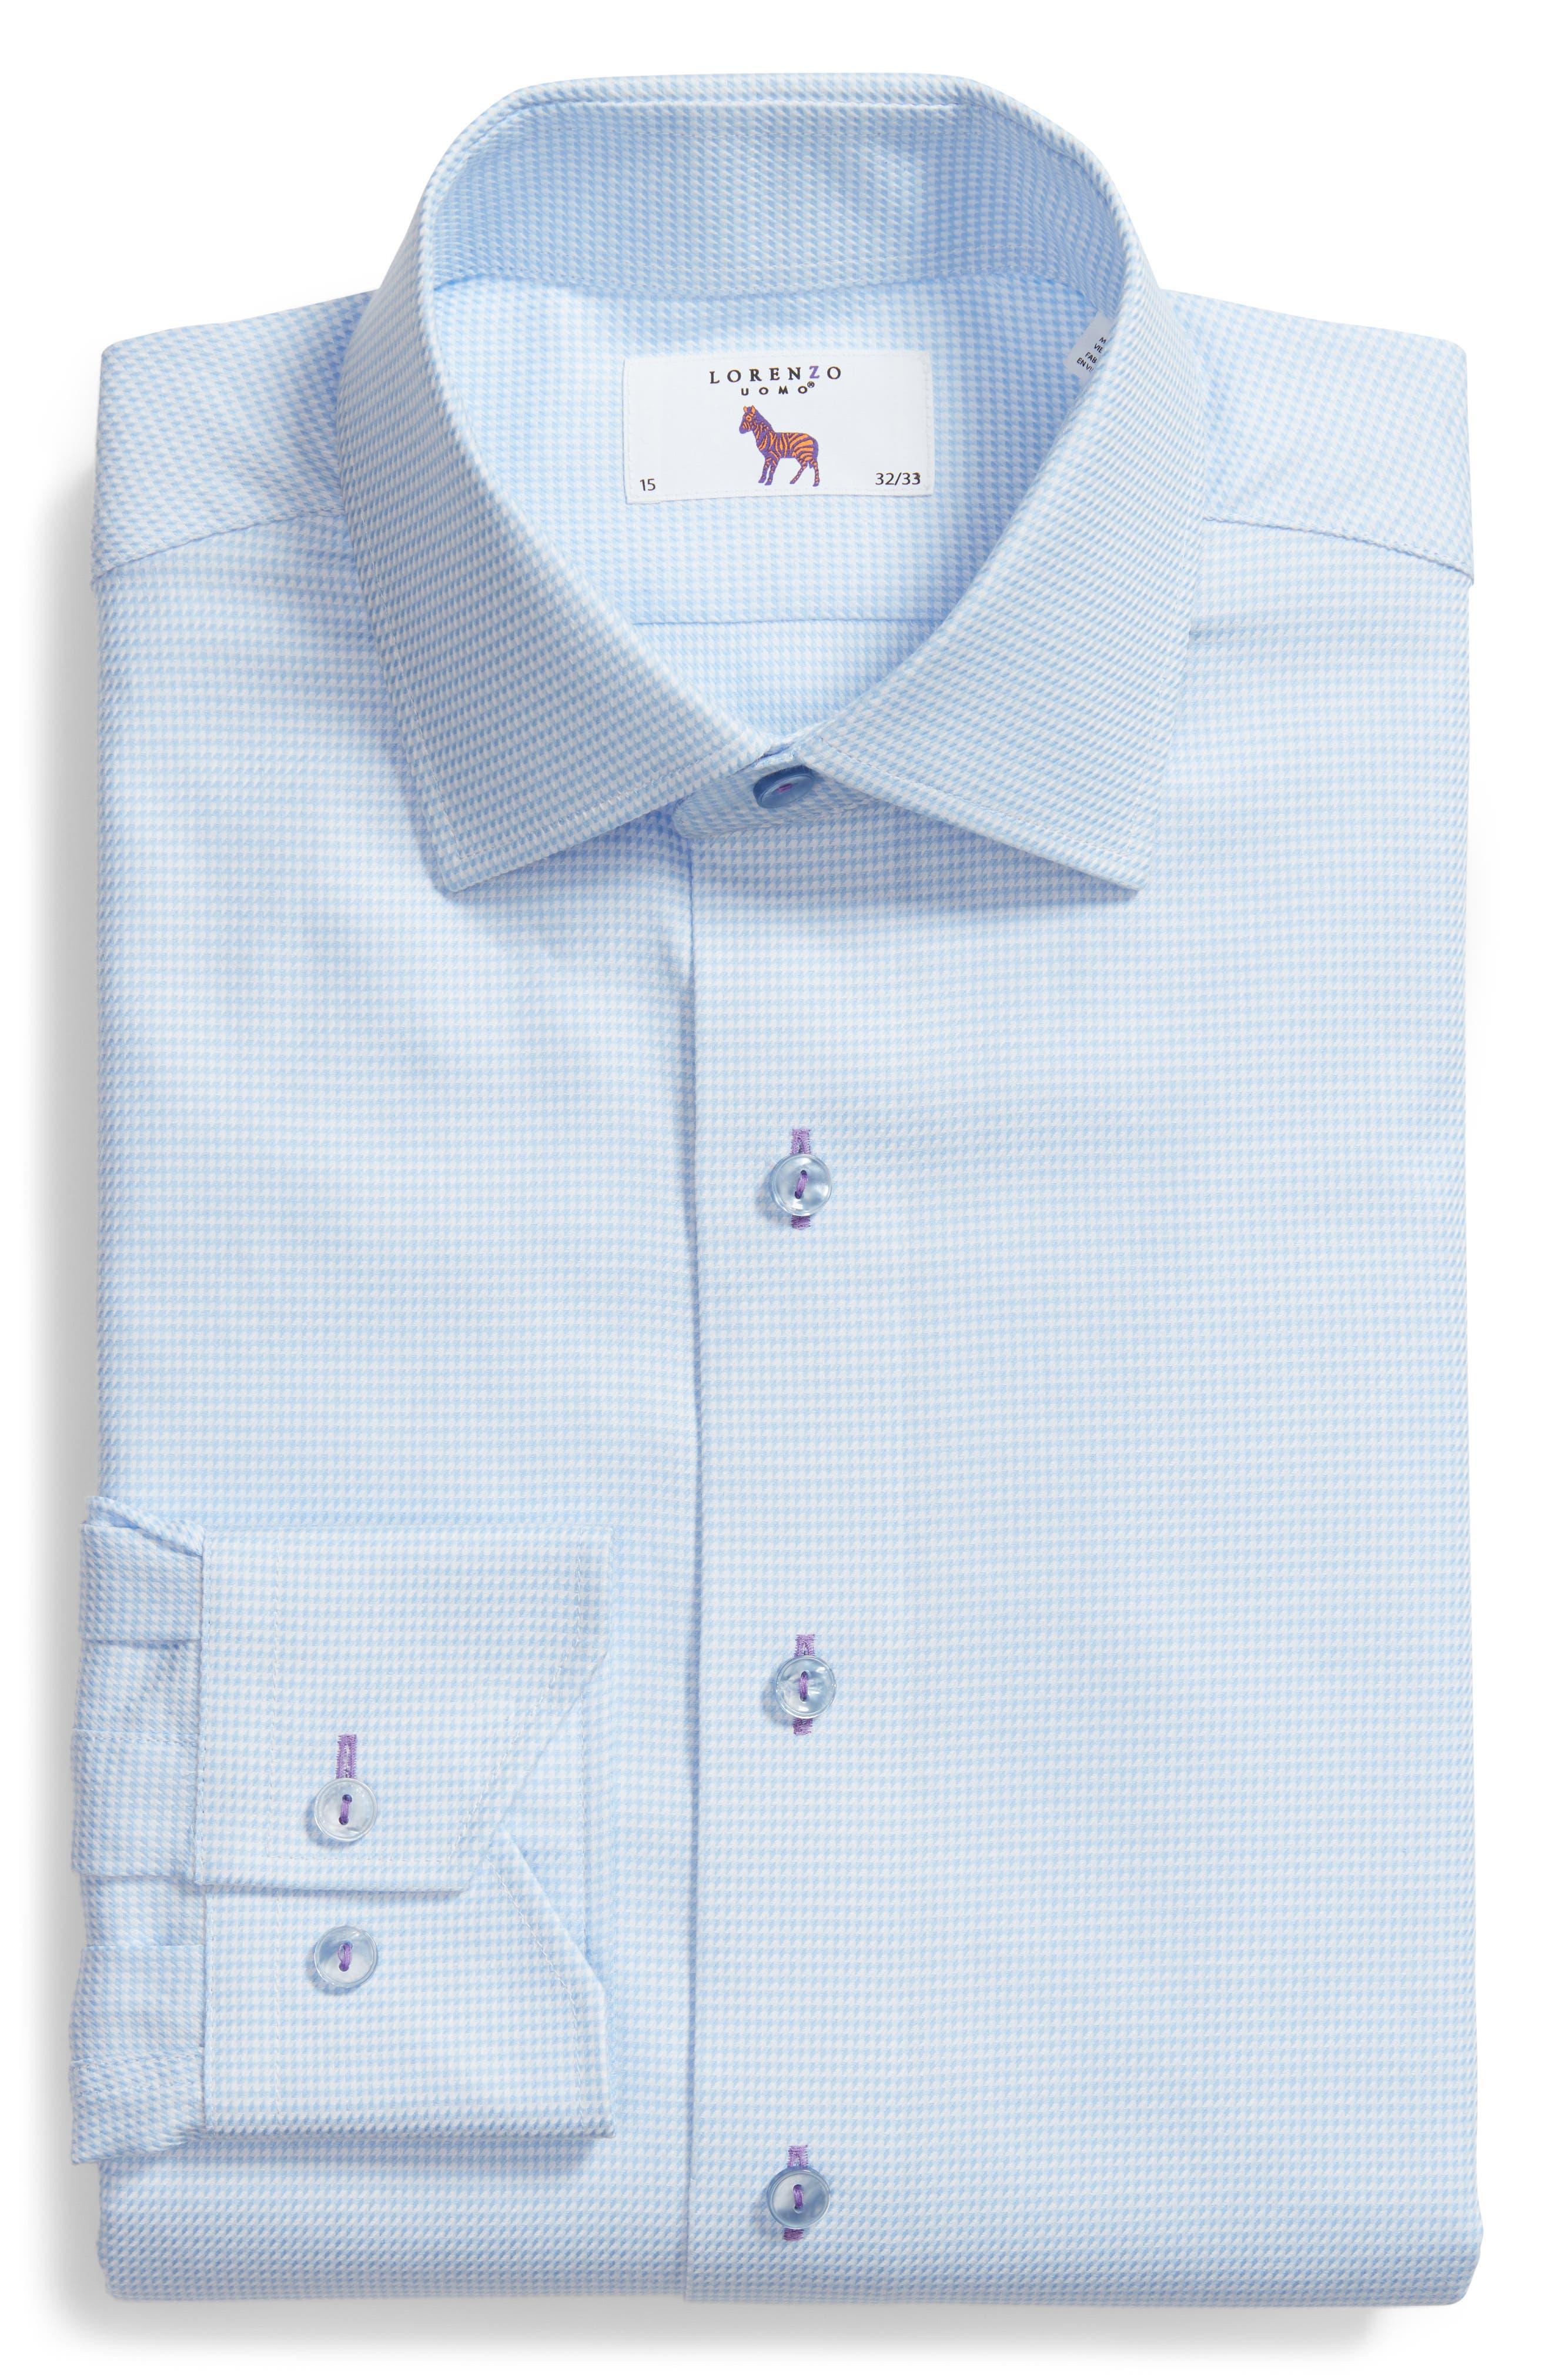 Trim Fit Houndstooth Dress Shirt,                             Alternate thumbnail 6, color,                             Light Blue